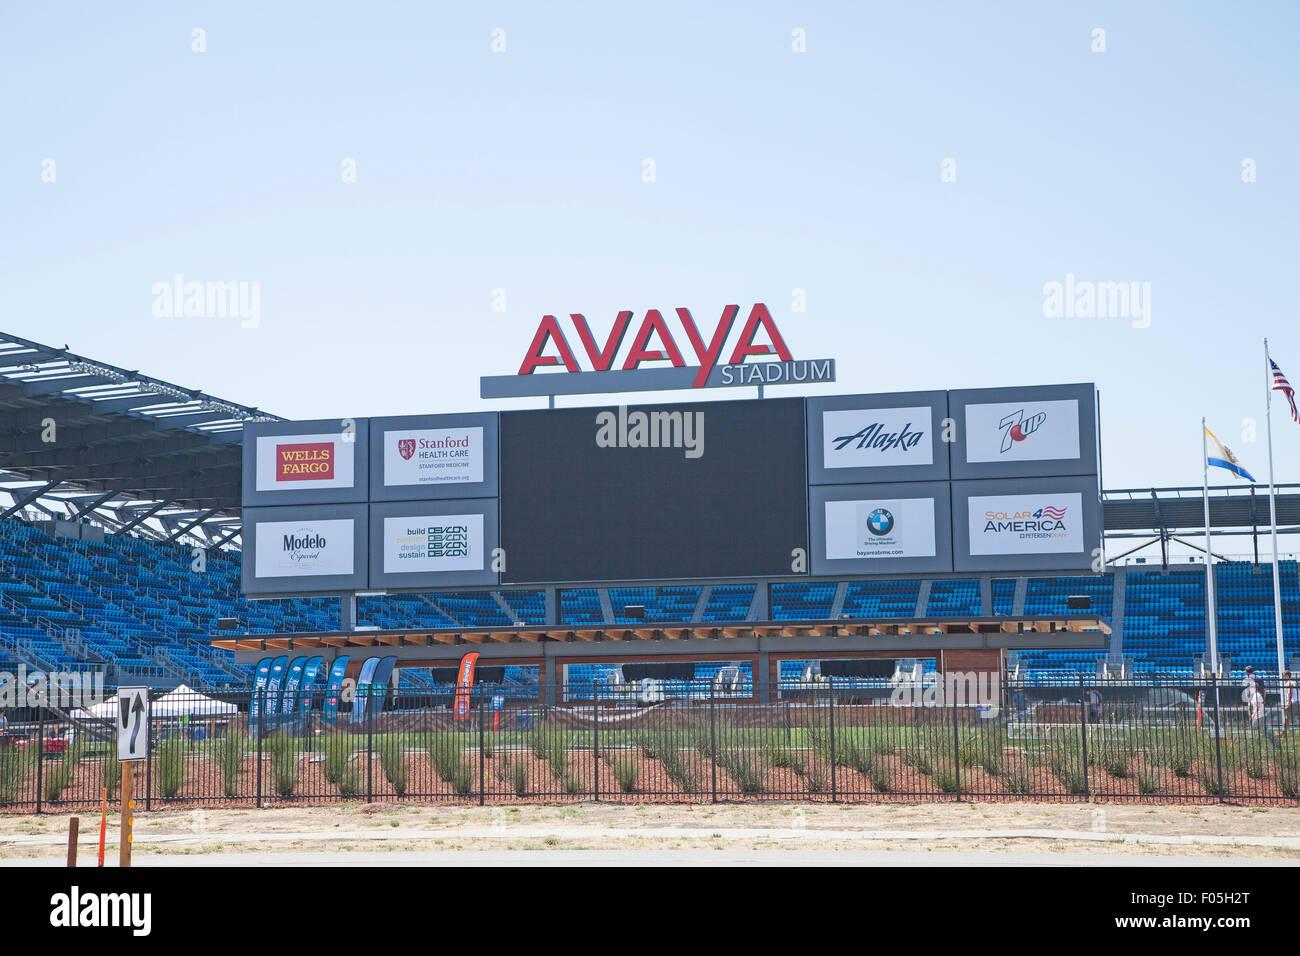 Avaya Stadium in San Jose, CA. - Stock Image